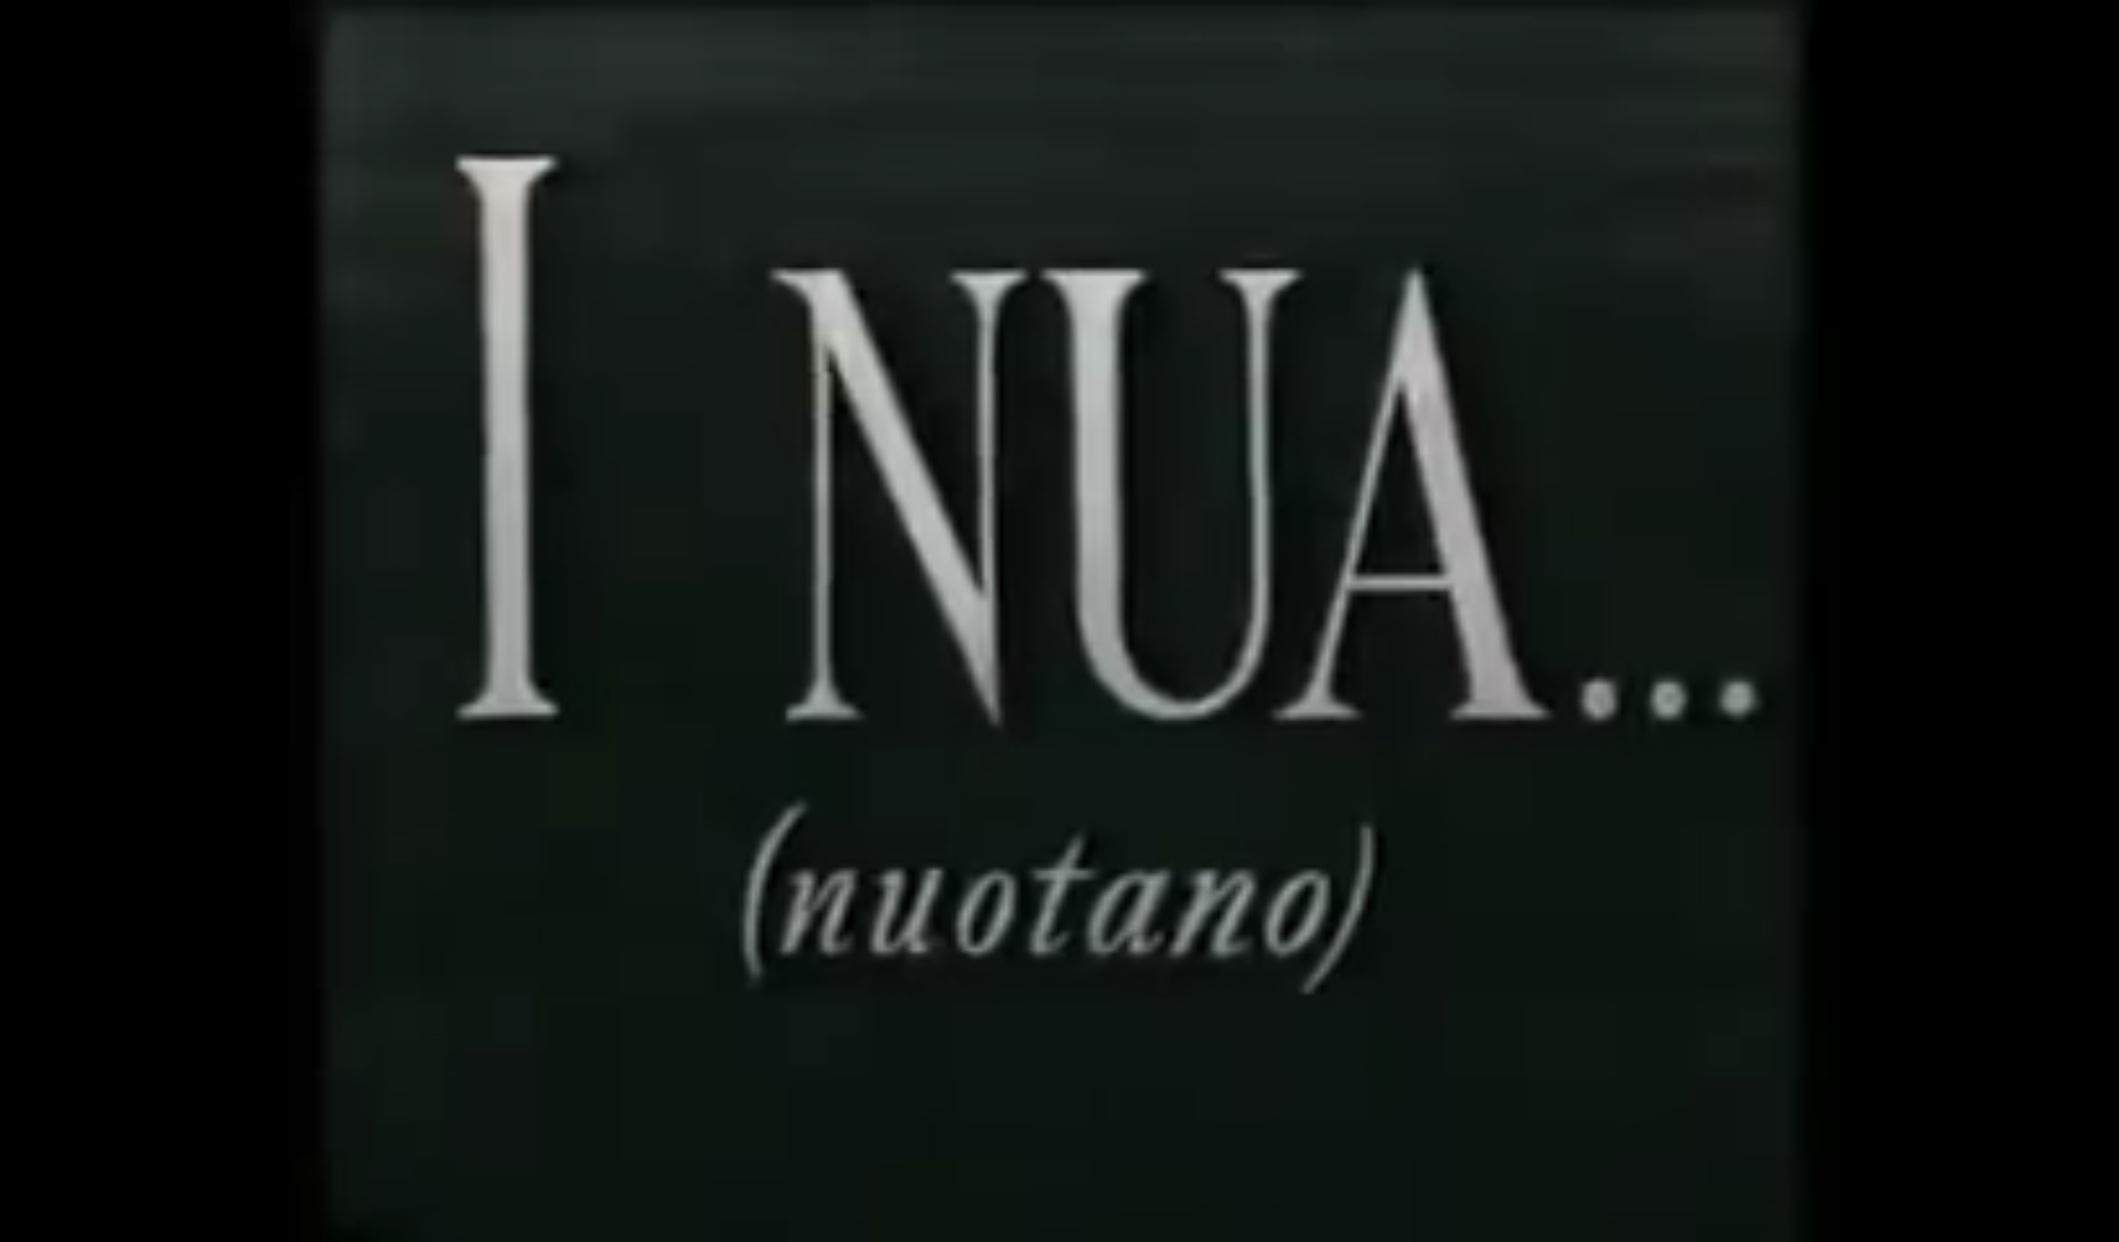 I nua (nuotano)